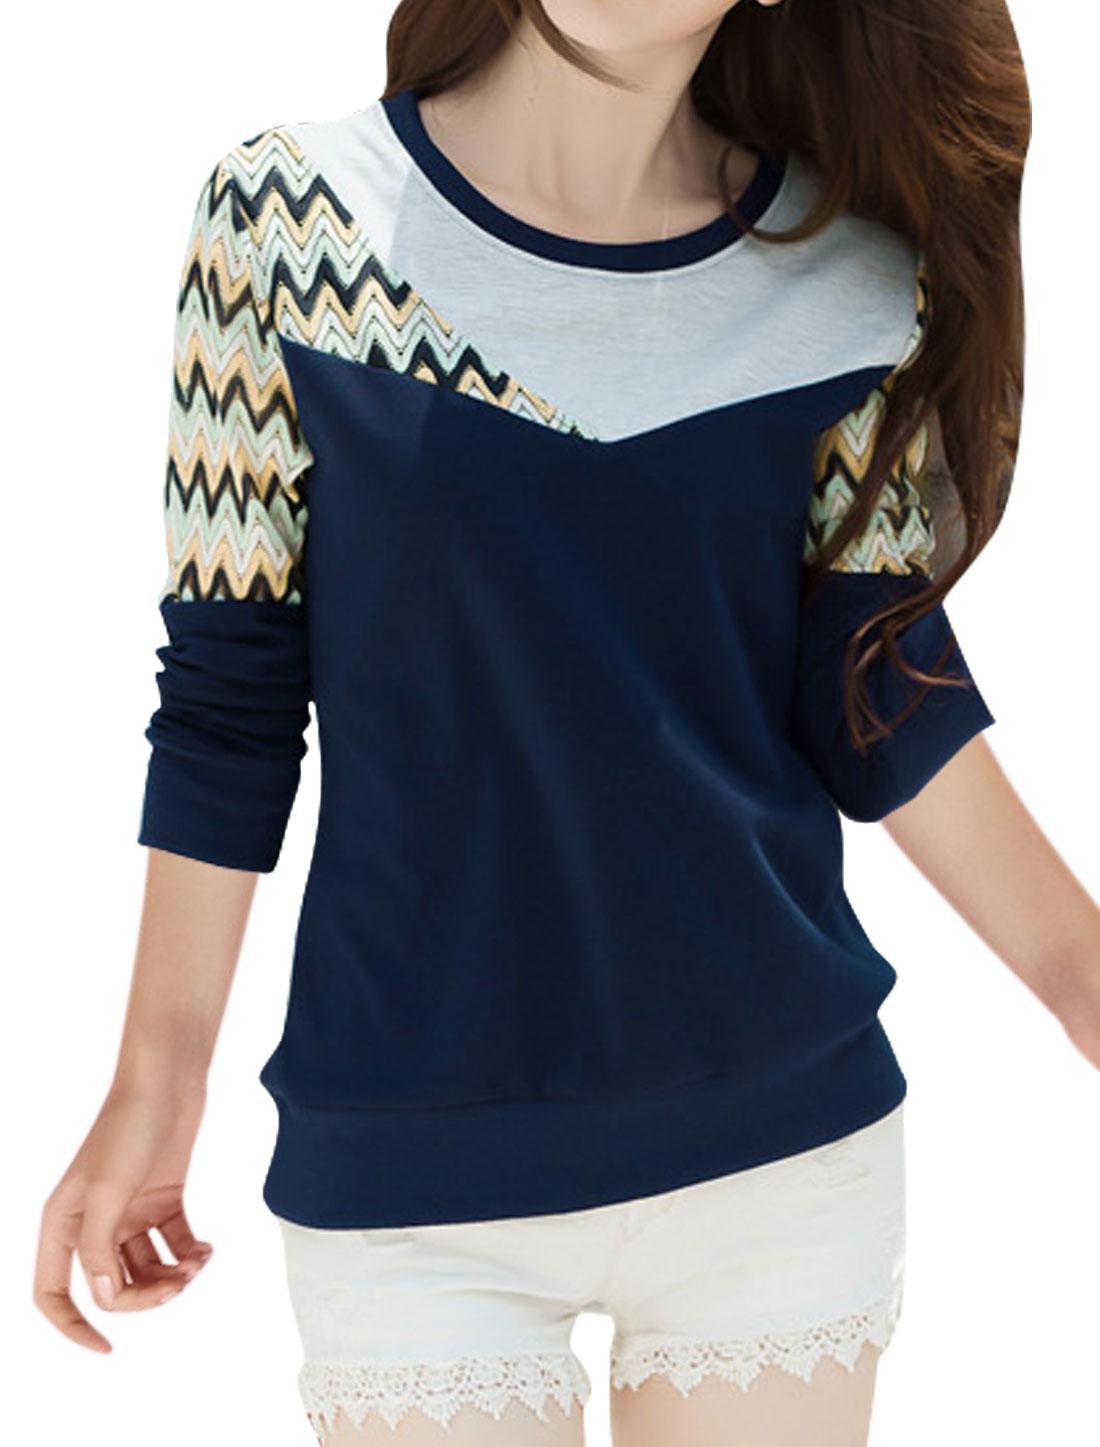 Women Long Sleeves Zig-zag Design Mesh Panel Top Blue M